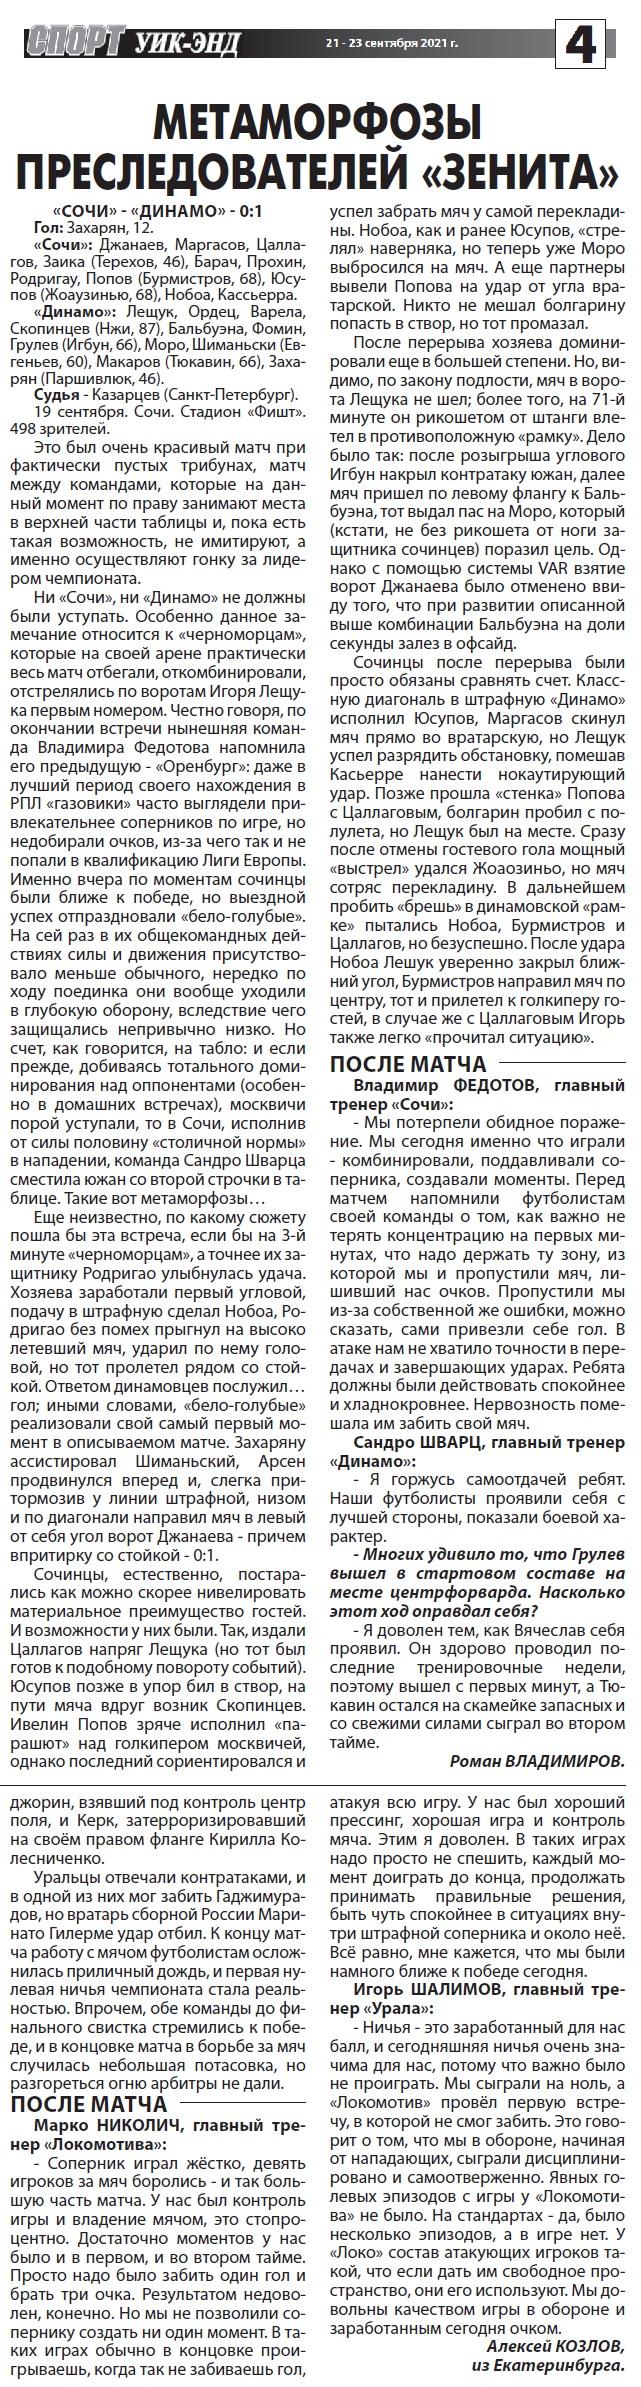 Сочи (Сочи) - Динамо (Москва) 0:1